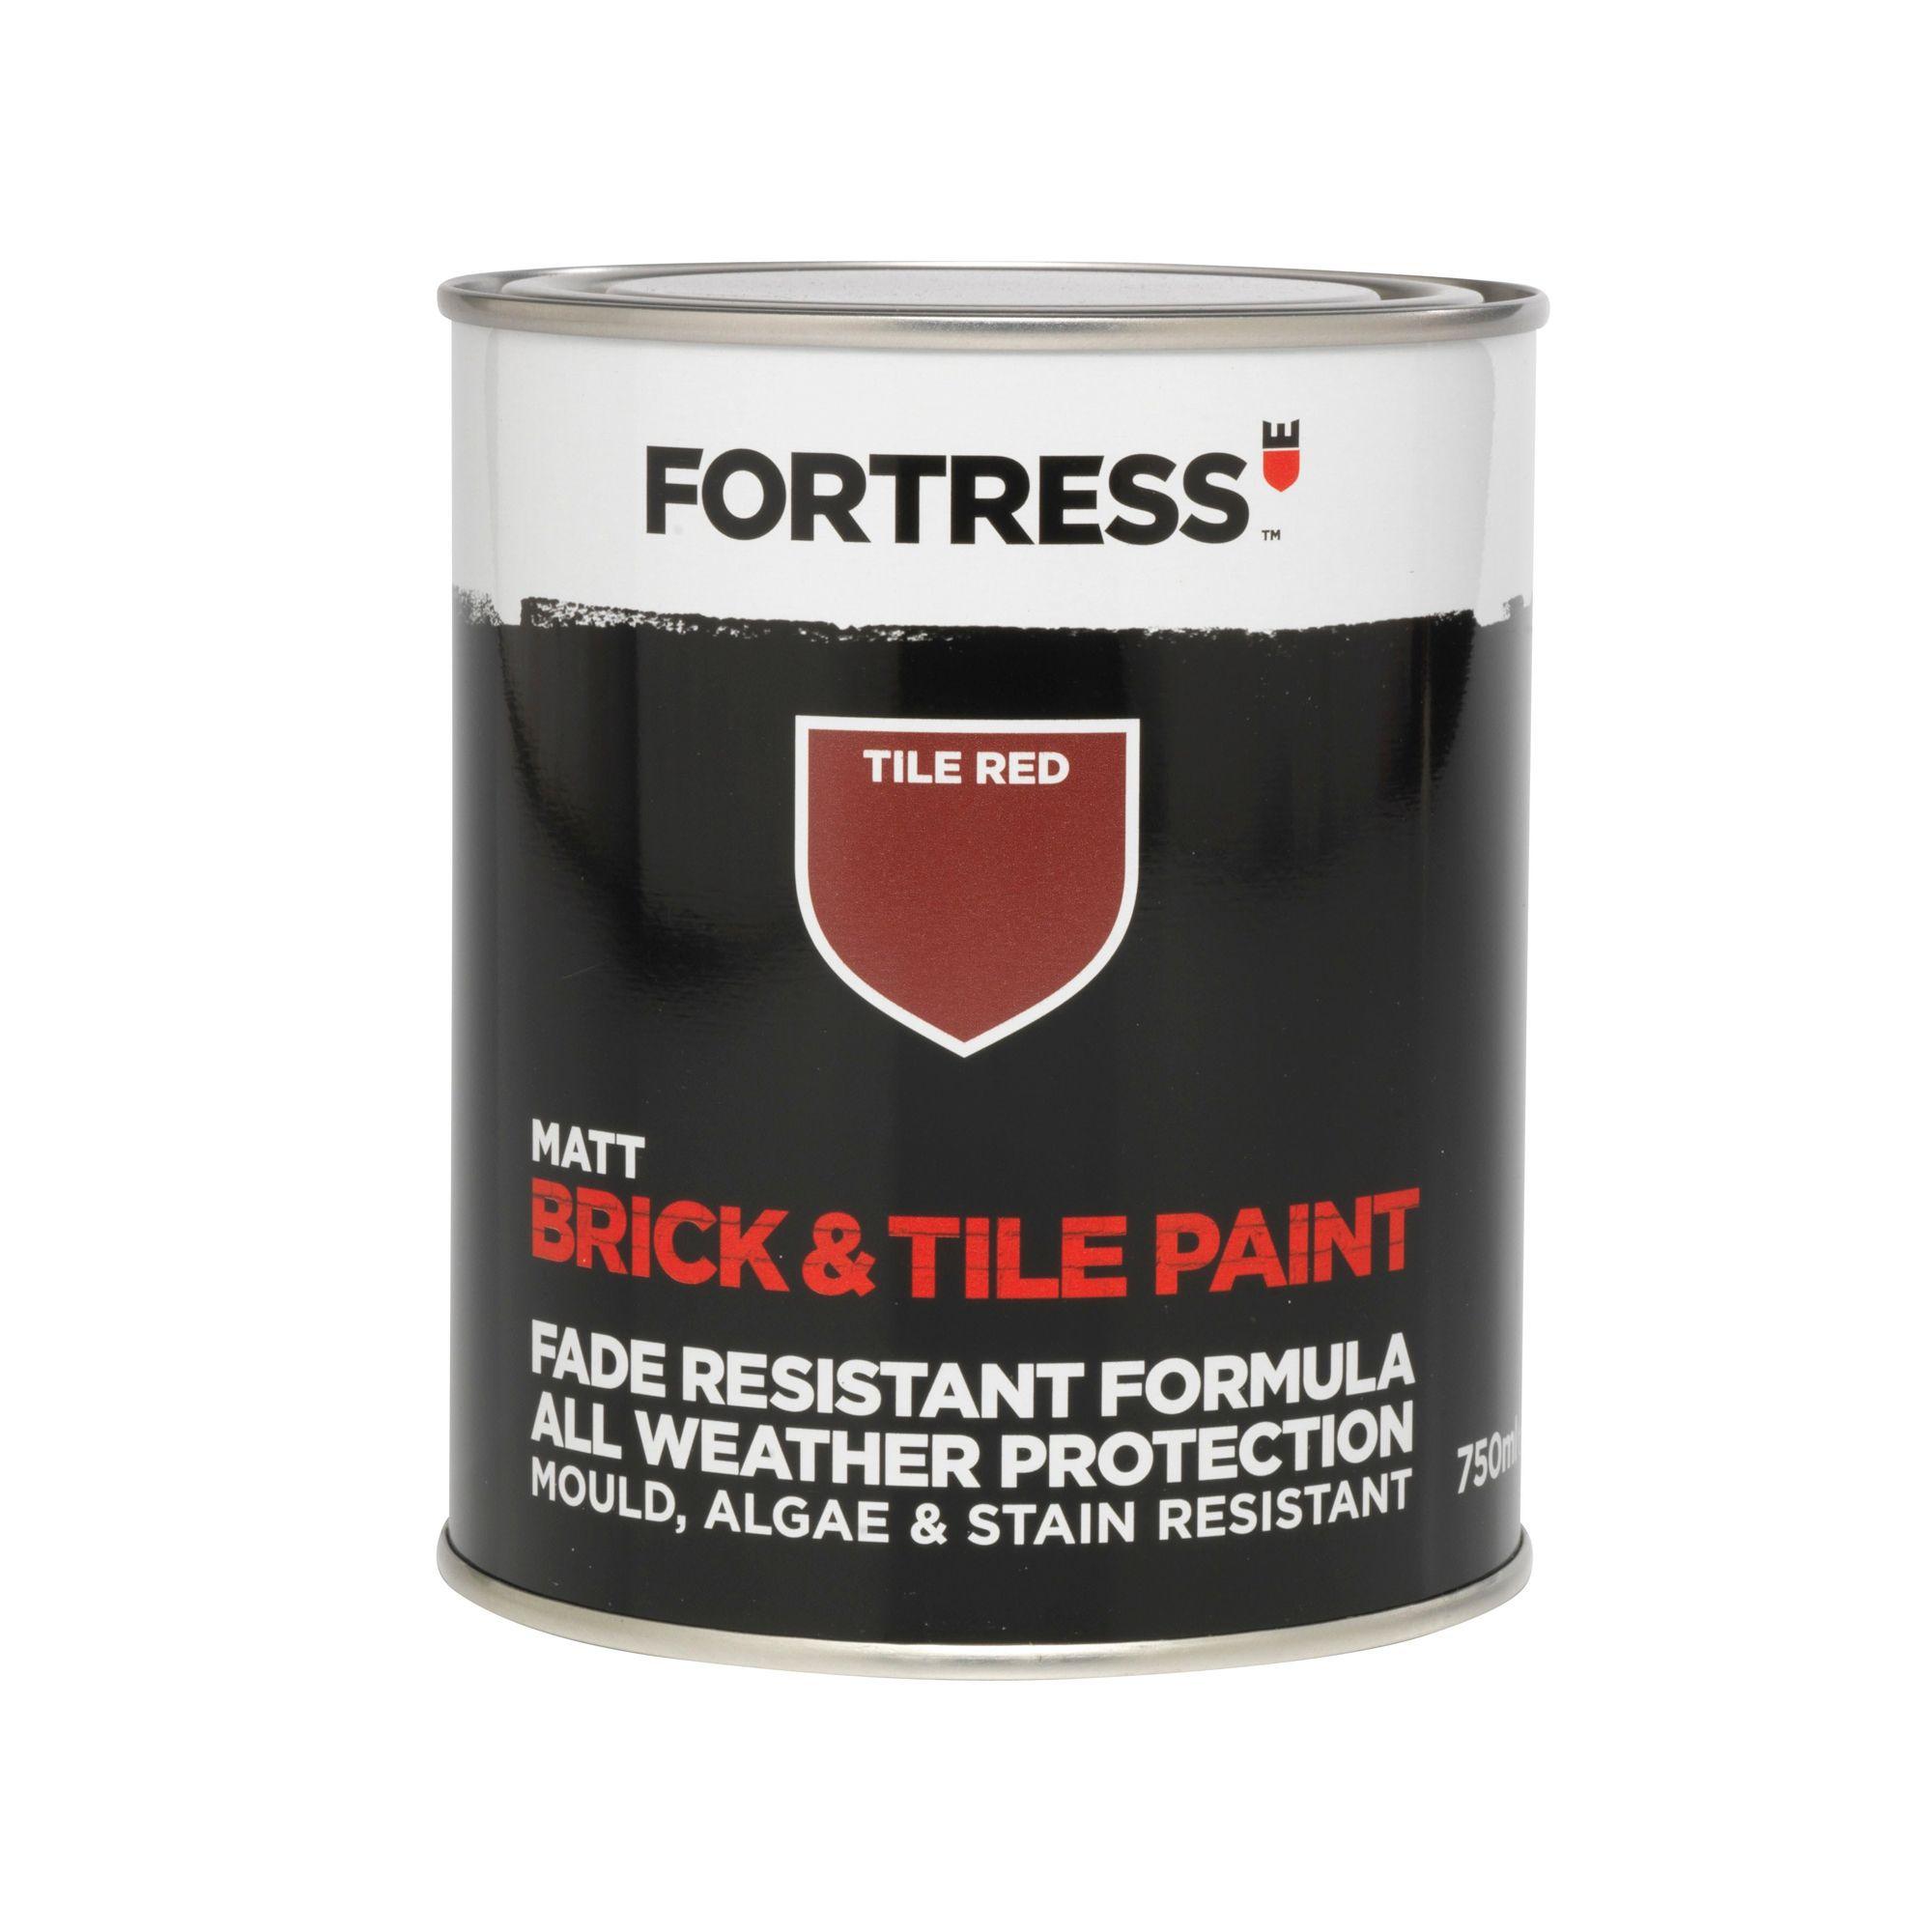 Fortress Tile Red Matt Brick & Tile Paint 750 ml | Departments | DIY ...